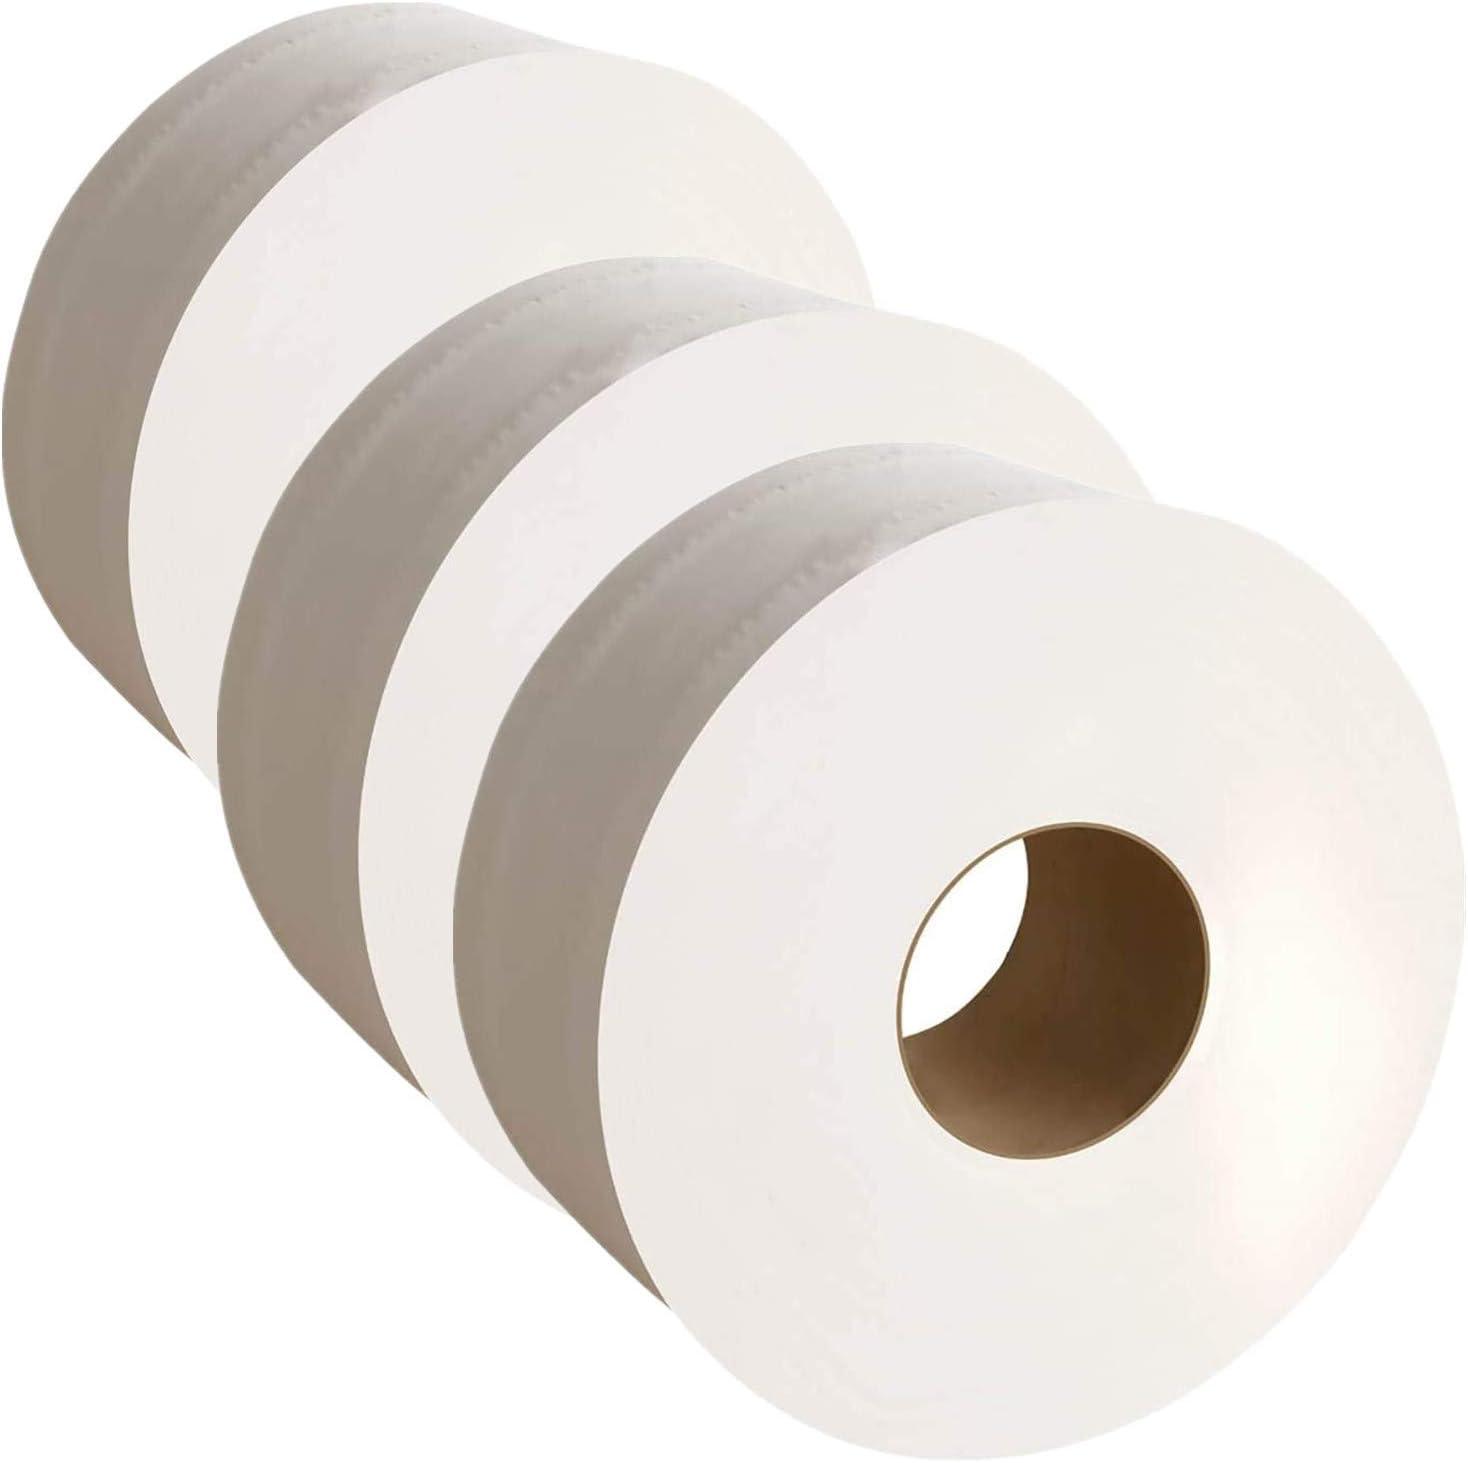 Mini Jumbo Toilet Tissue Dispenser 12 Rolls of 2ply Toilet Tissue